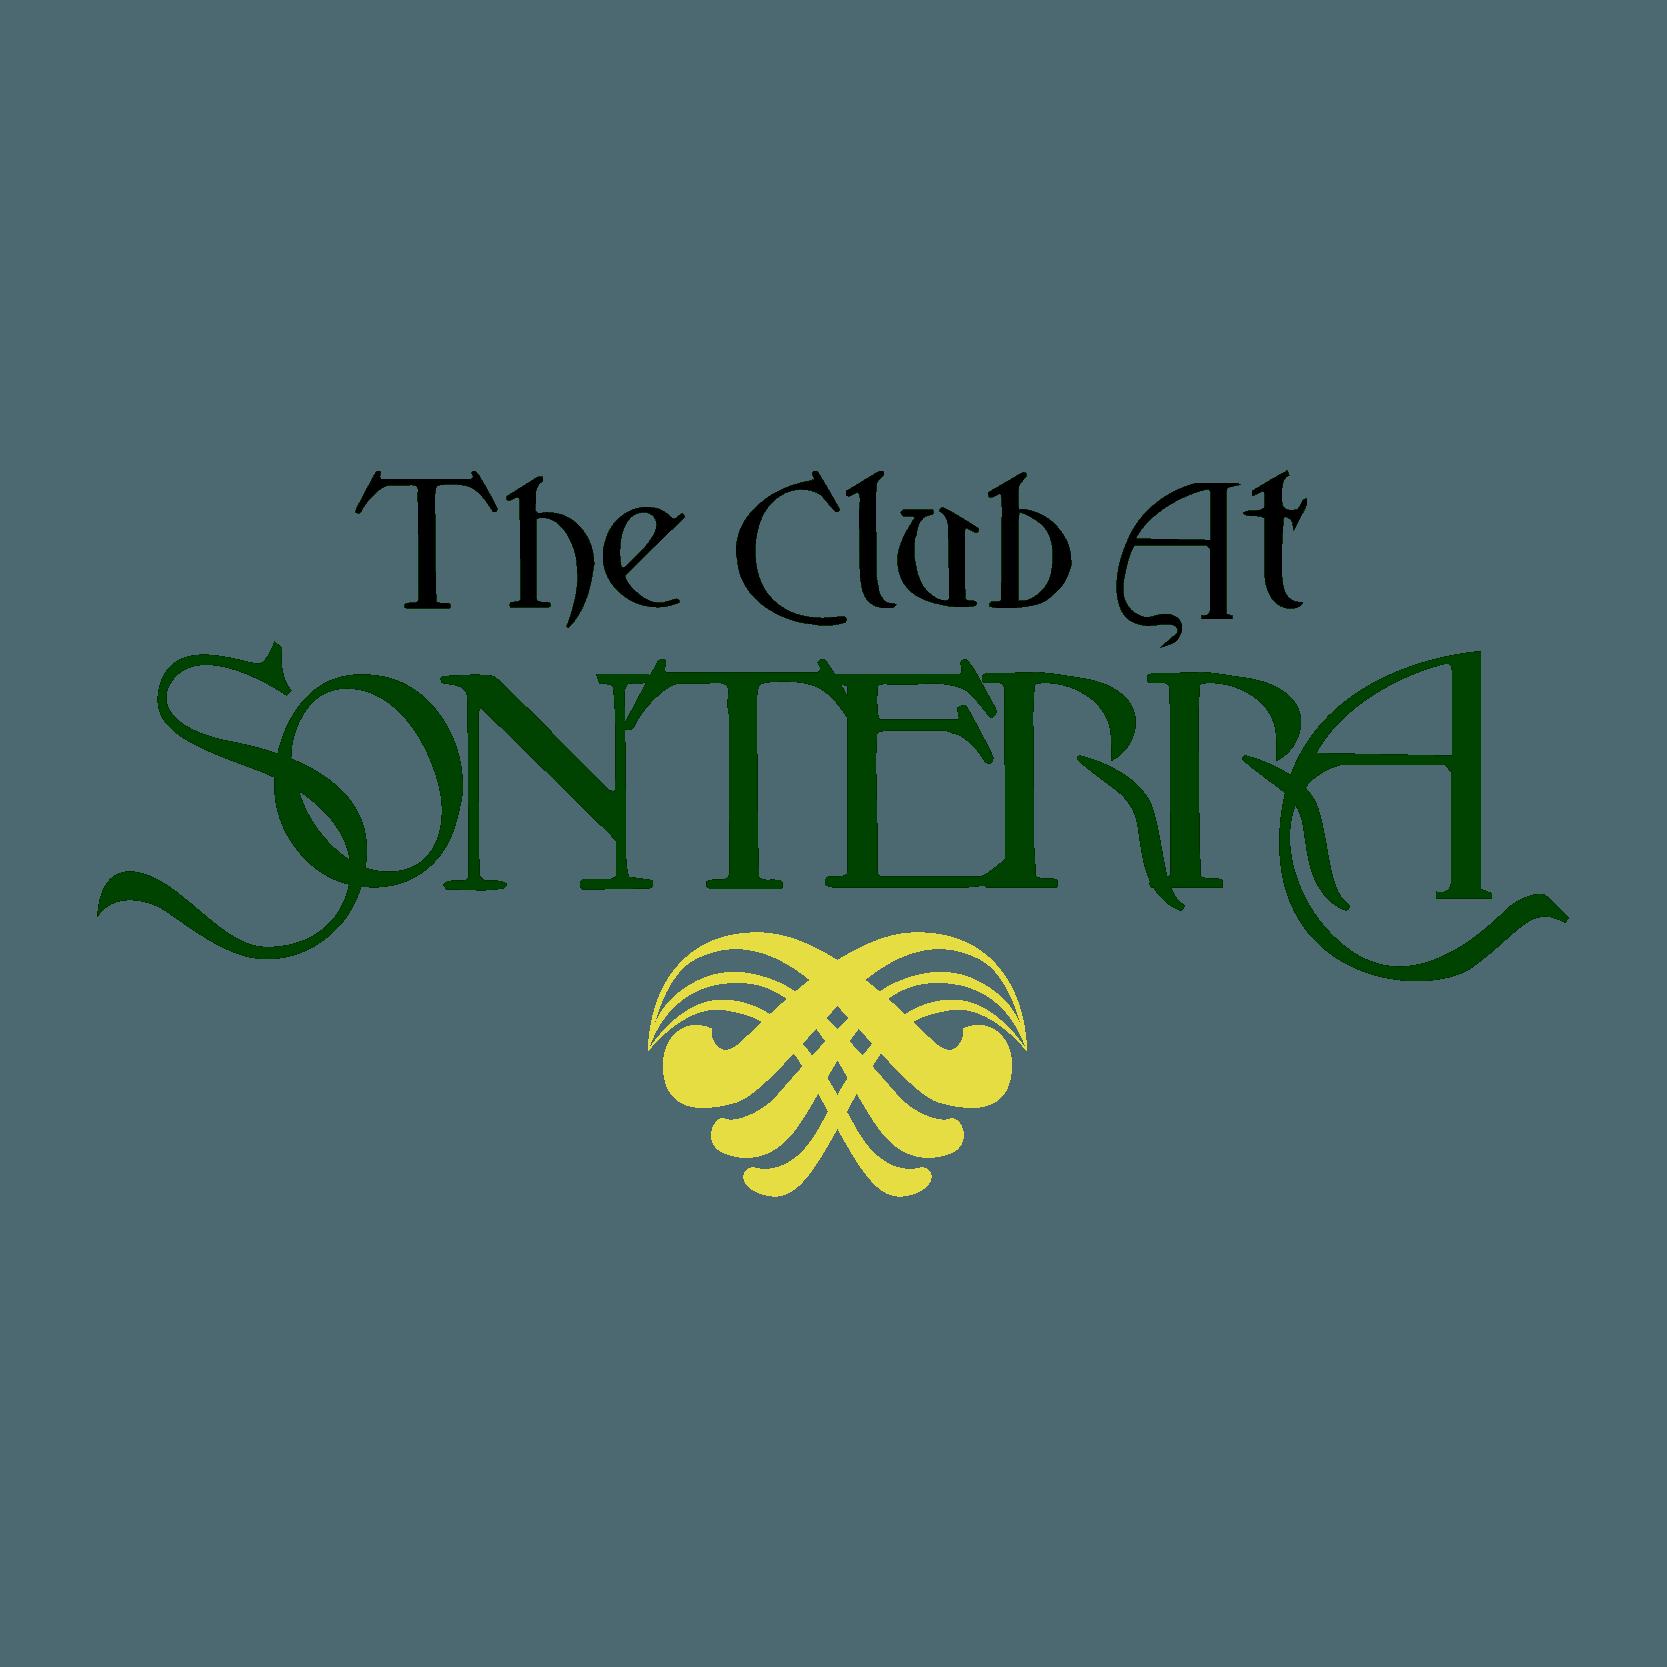 The Club at Sonterra